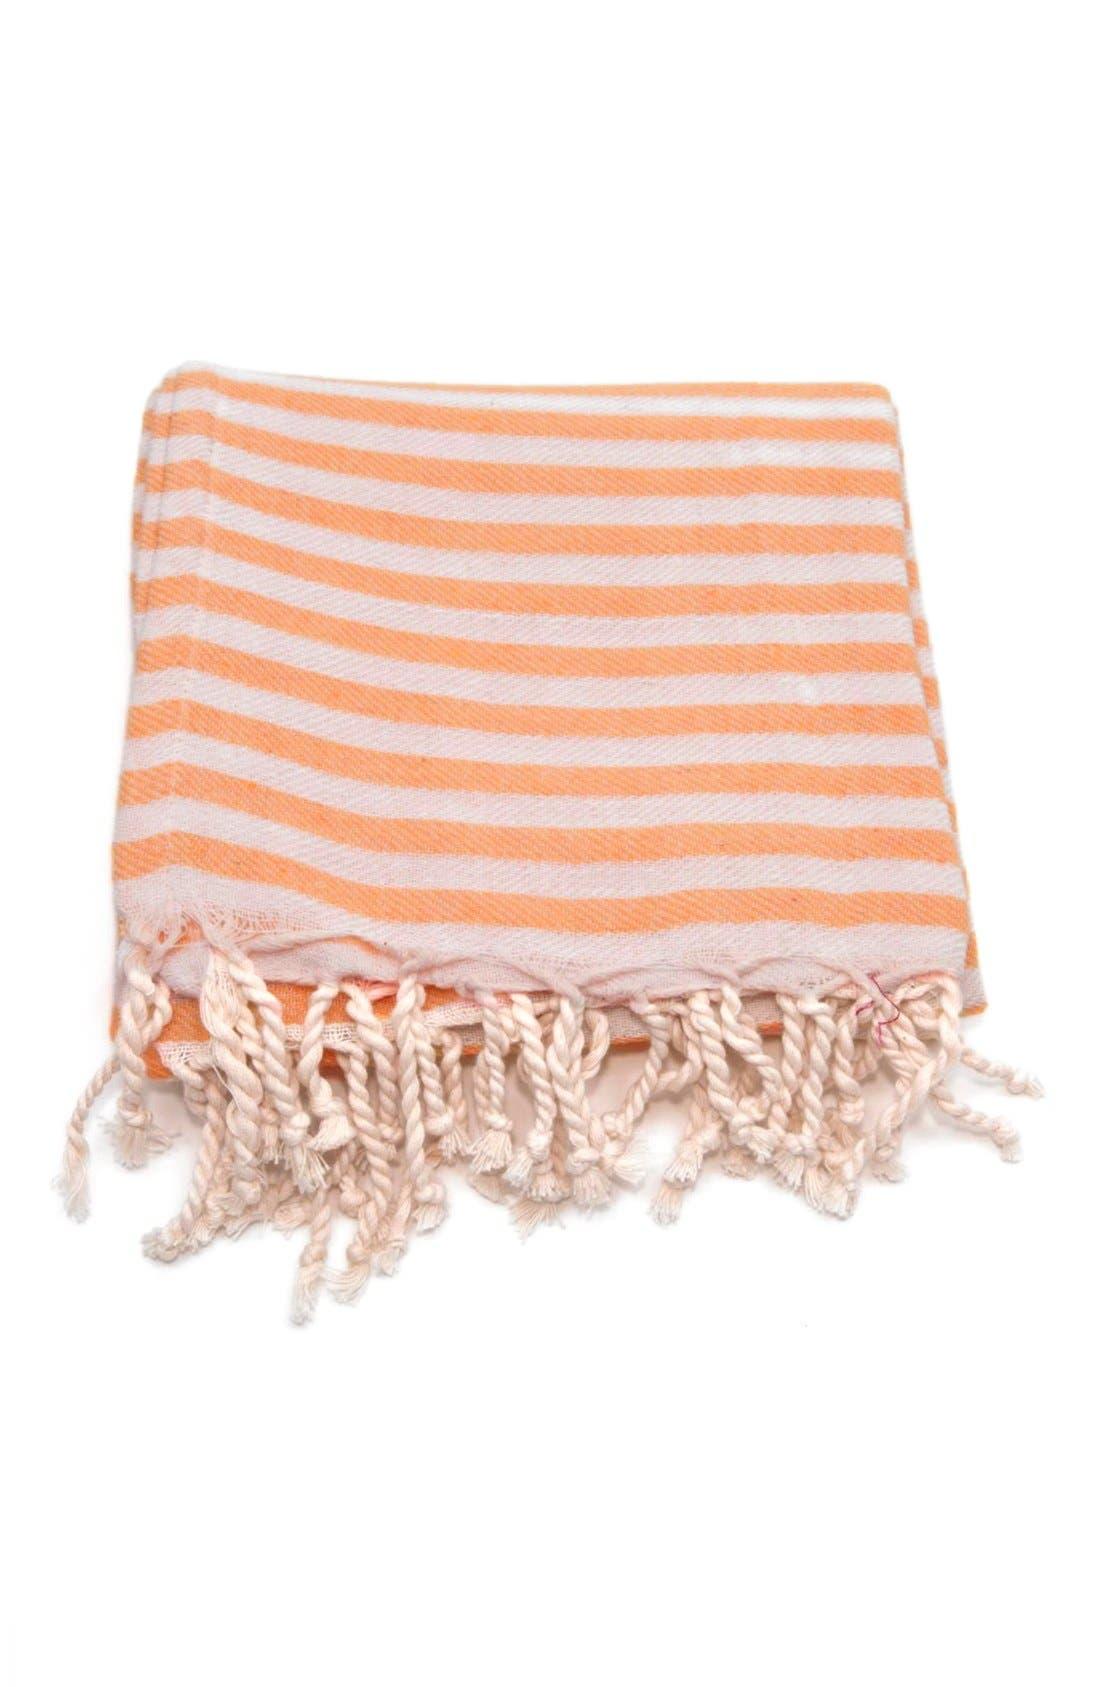 ,                             'Fun in the Sun' Turkish Pestemal Towel,                             Alternate thumbnail 28, color,                             800